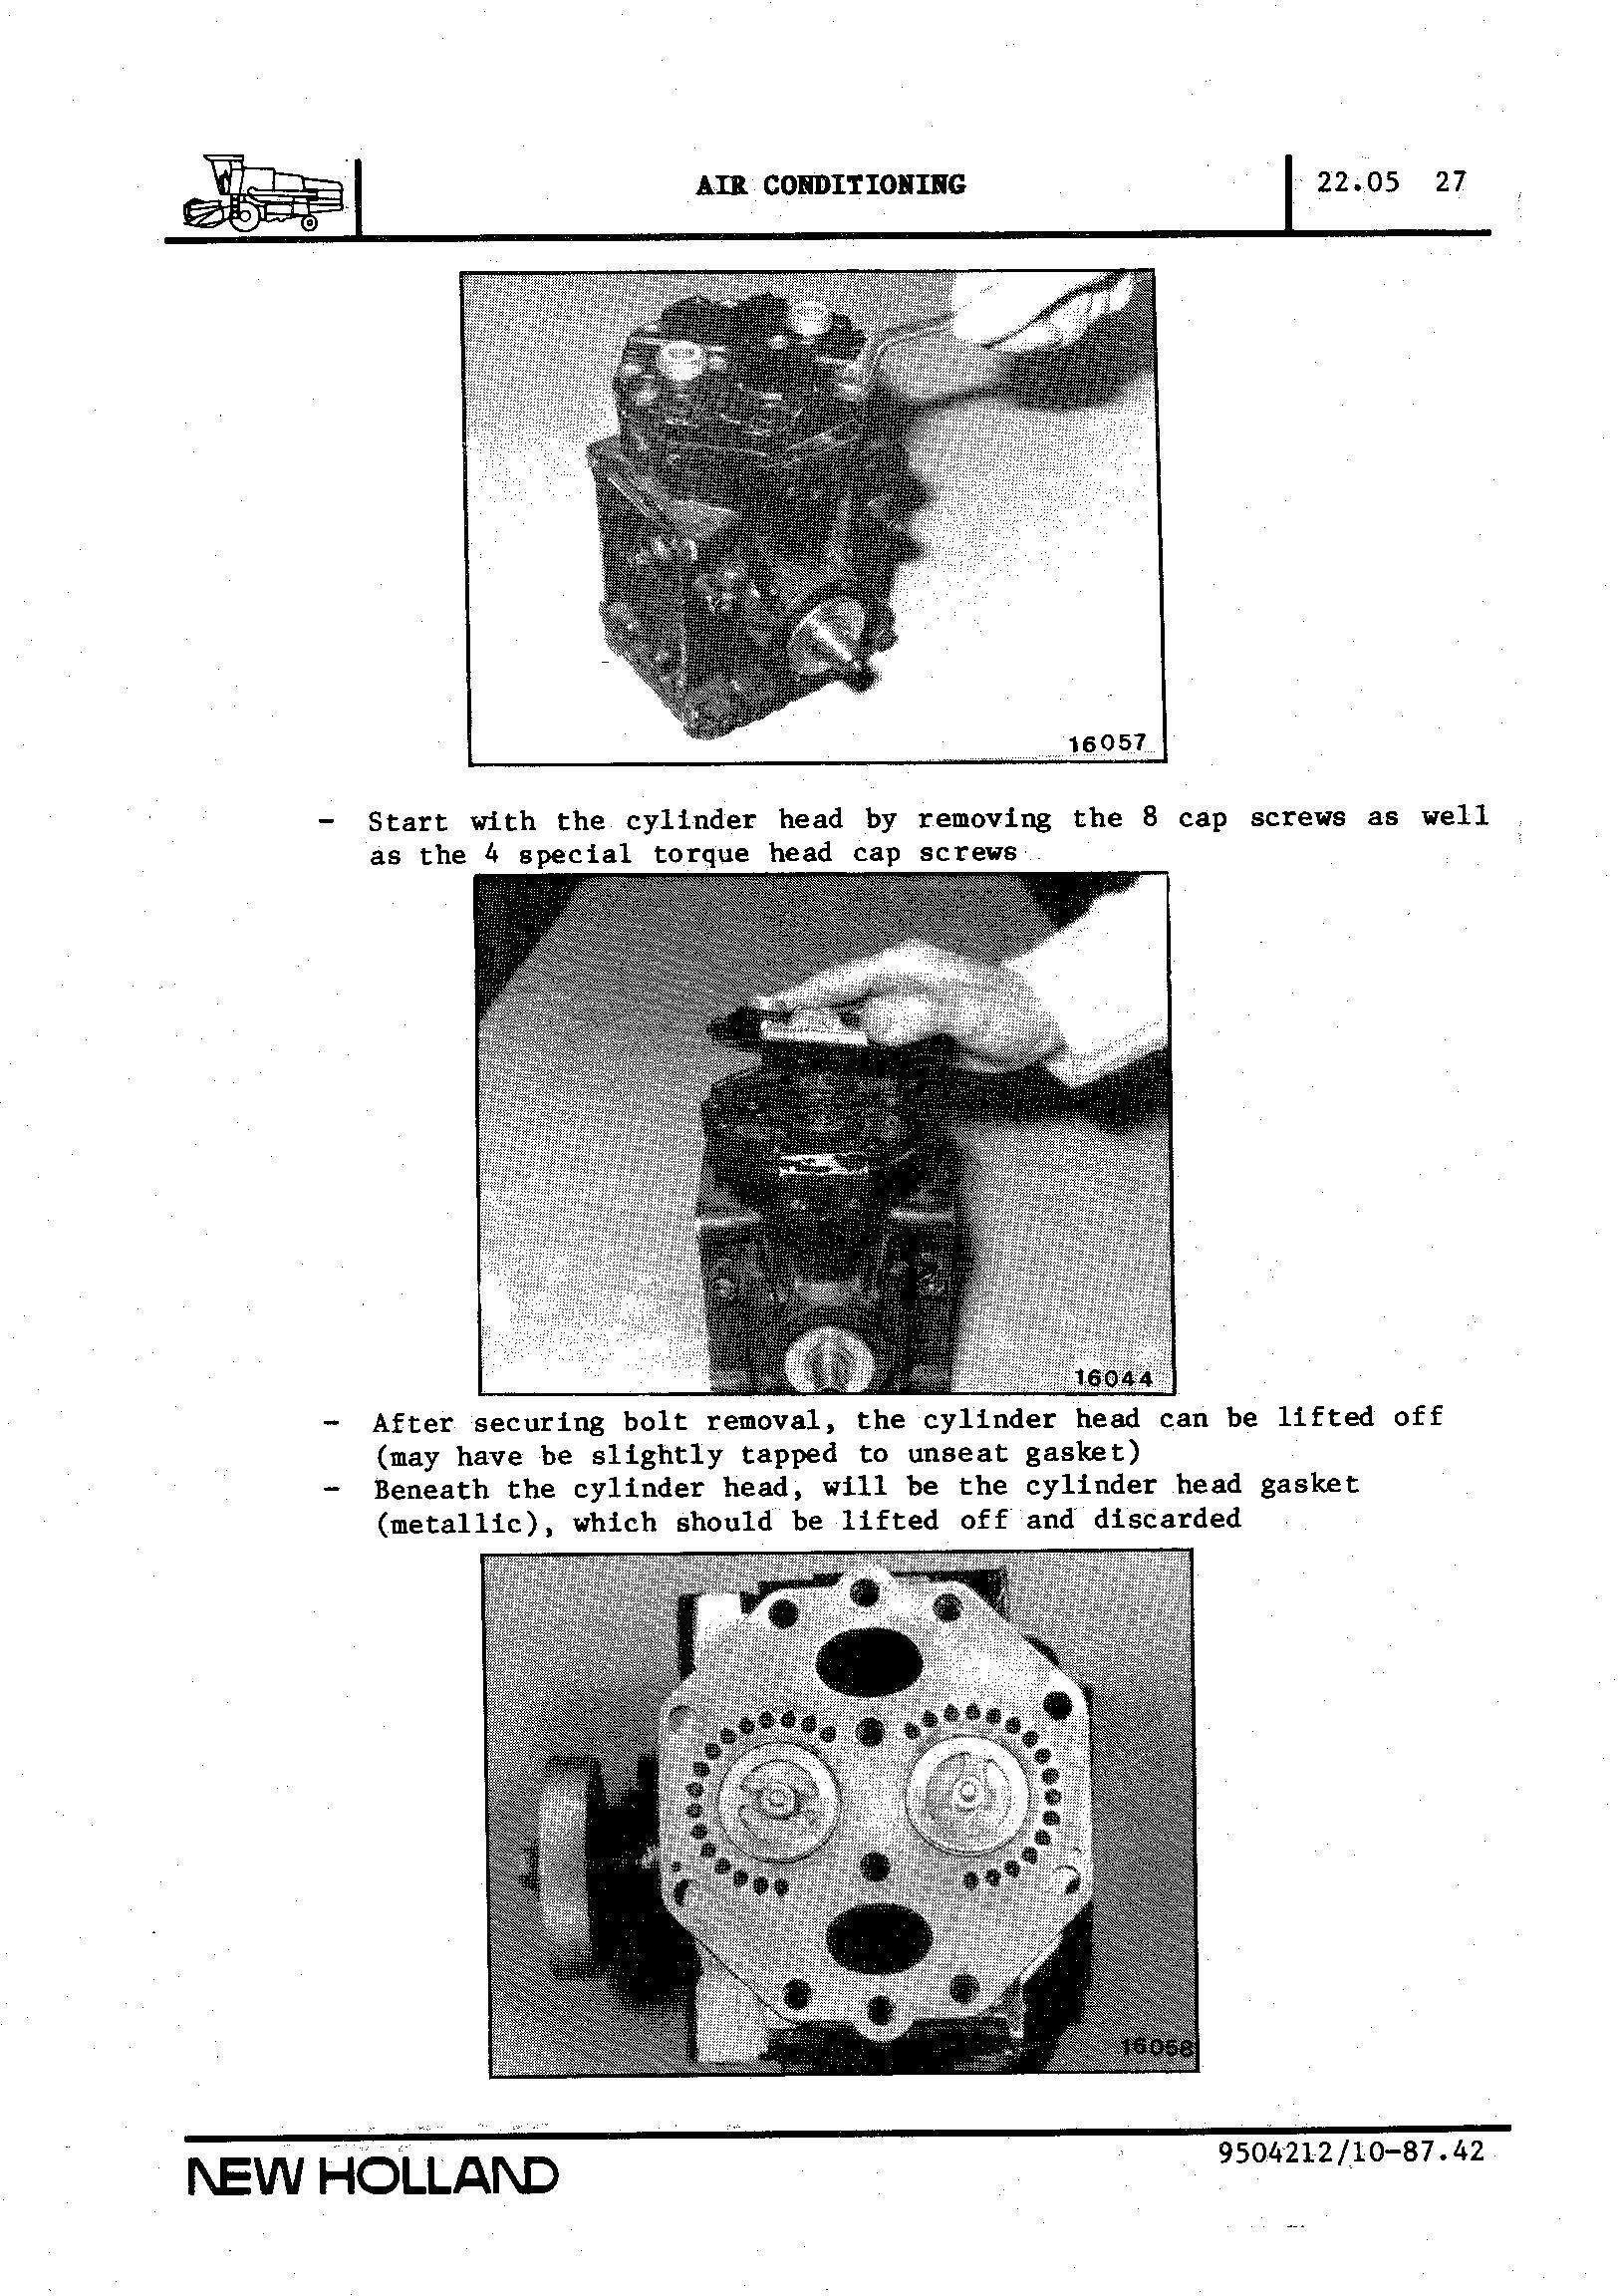 New Holland TF42, TF44, TF46, TX34 Combines Training manual - 3